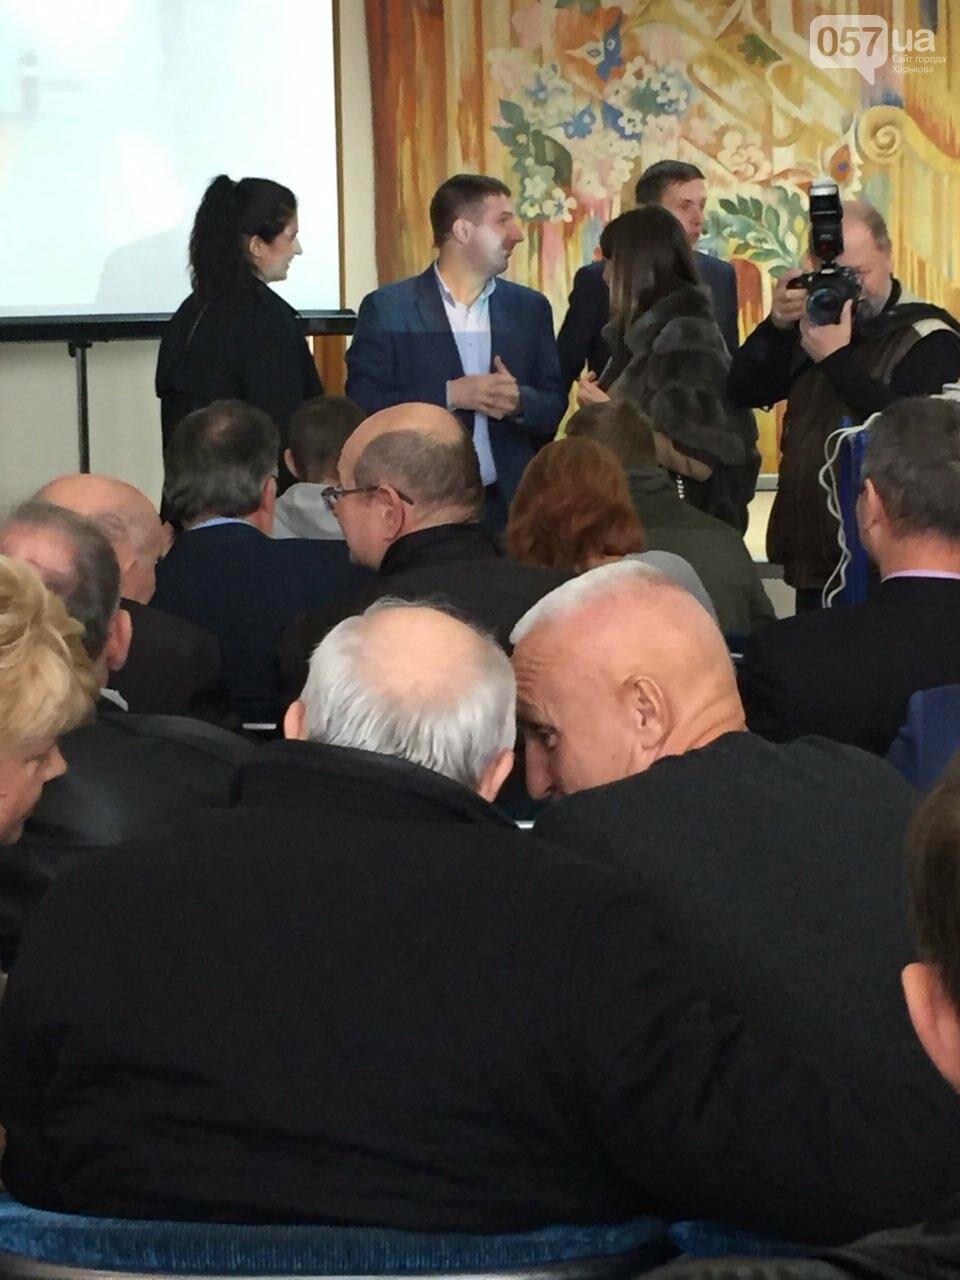 Зеленский в Харькове: текстовый стрим, - ФОТО, фото-10